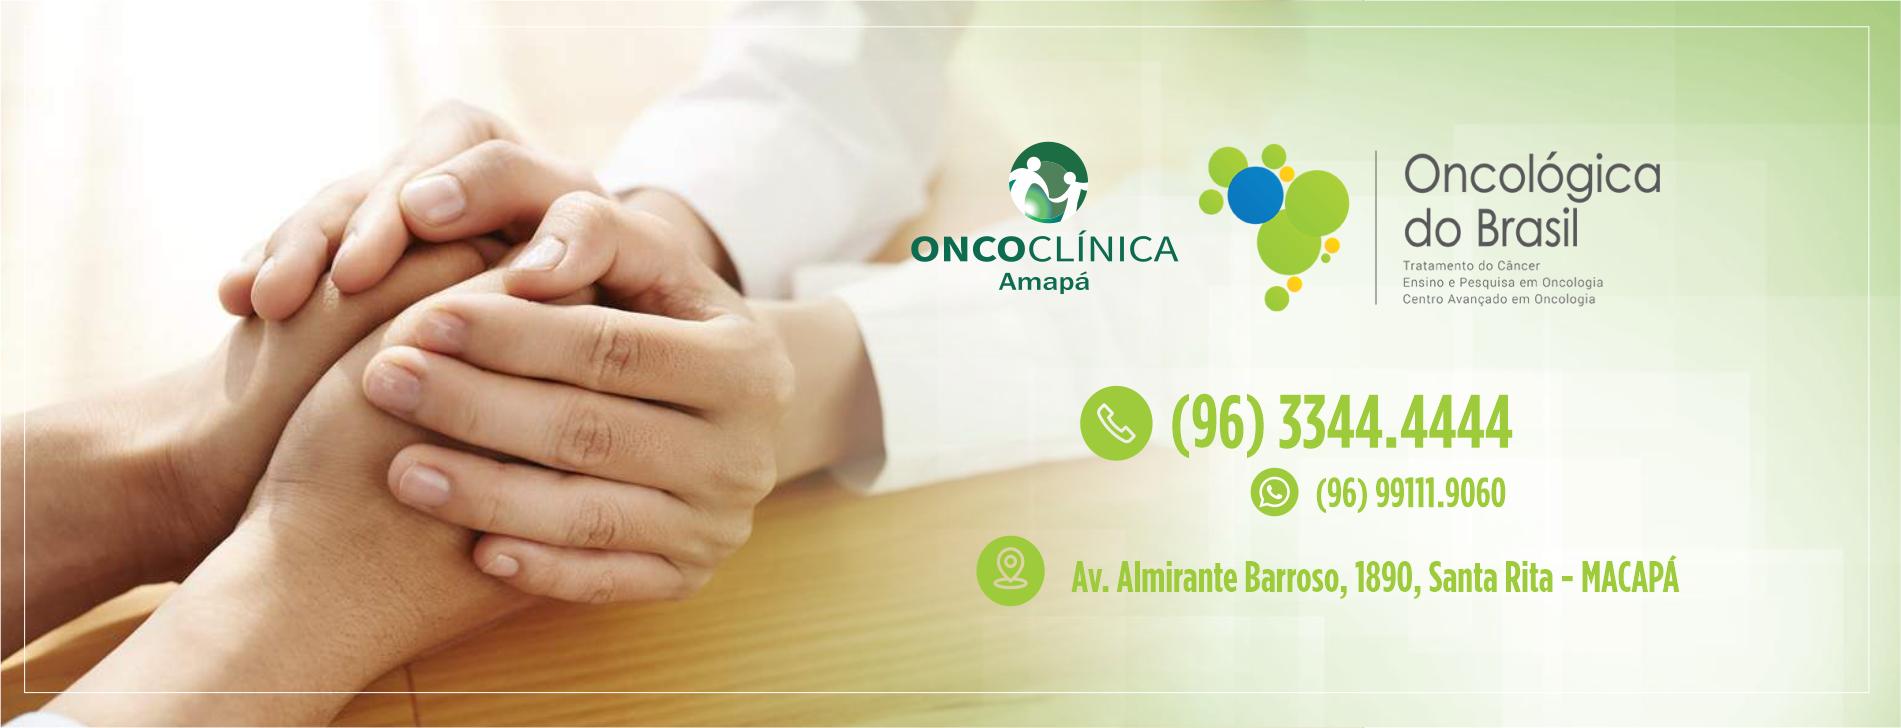 ONCOCLINICA E ONCOLOGICA